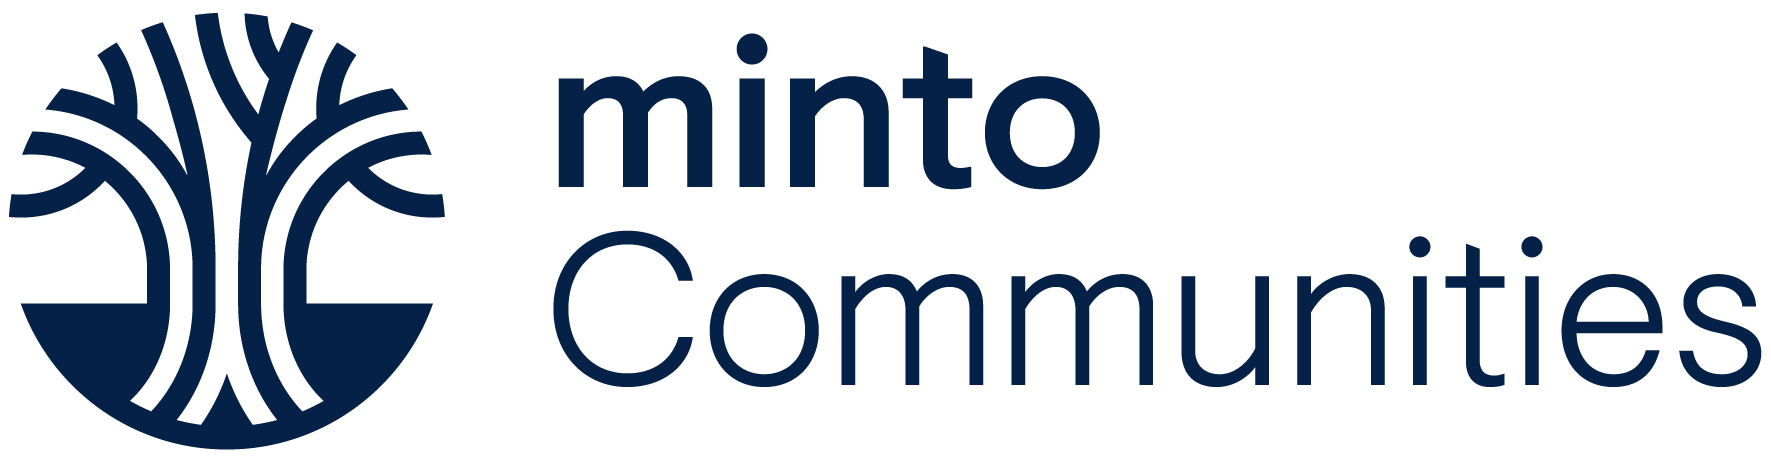 Minto Communities USA